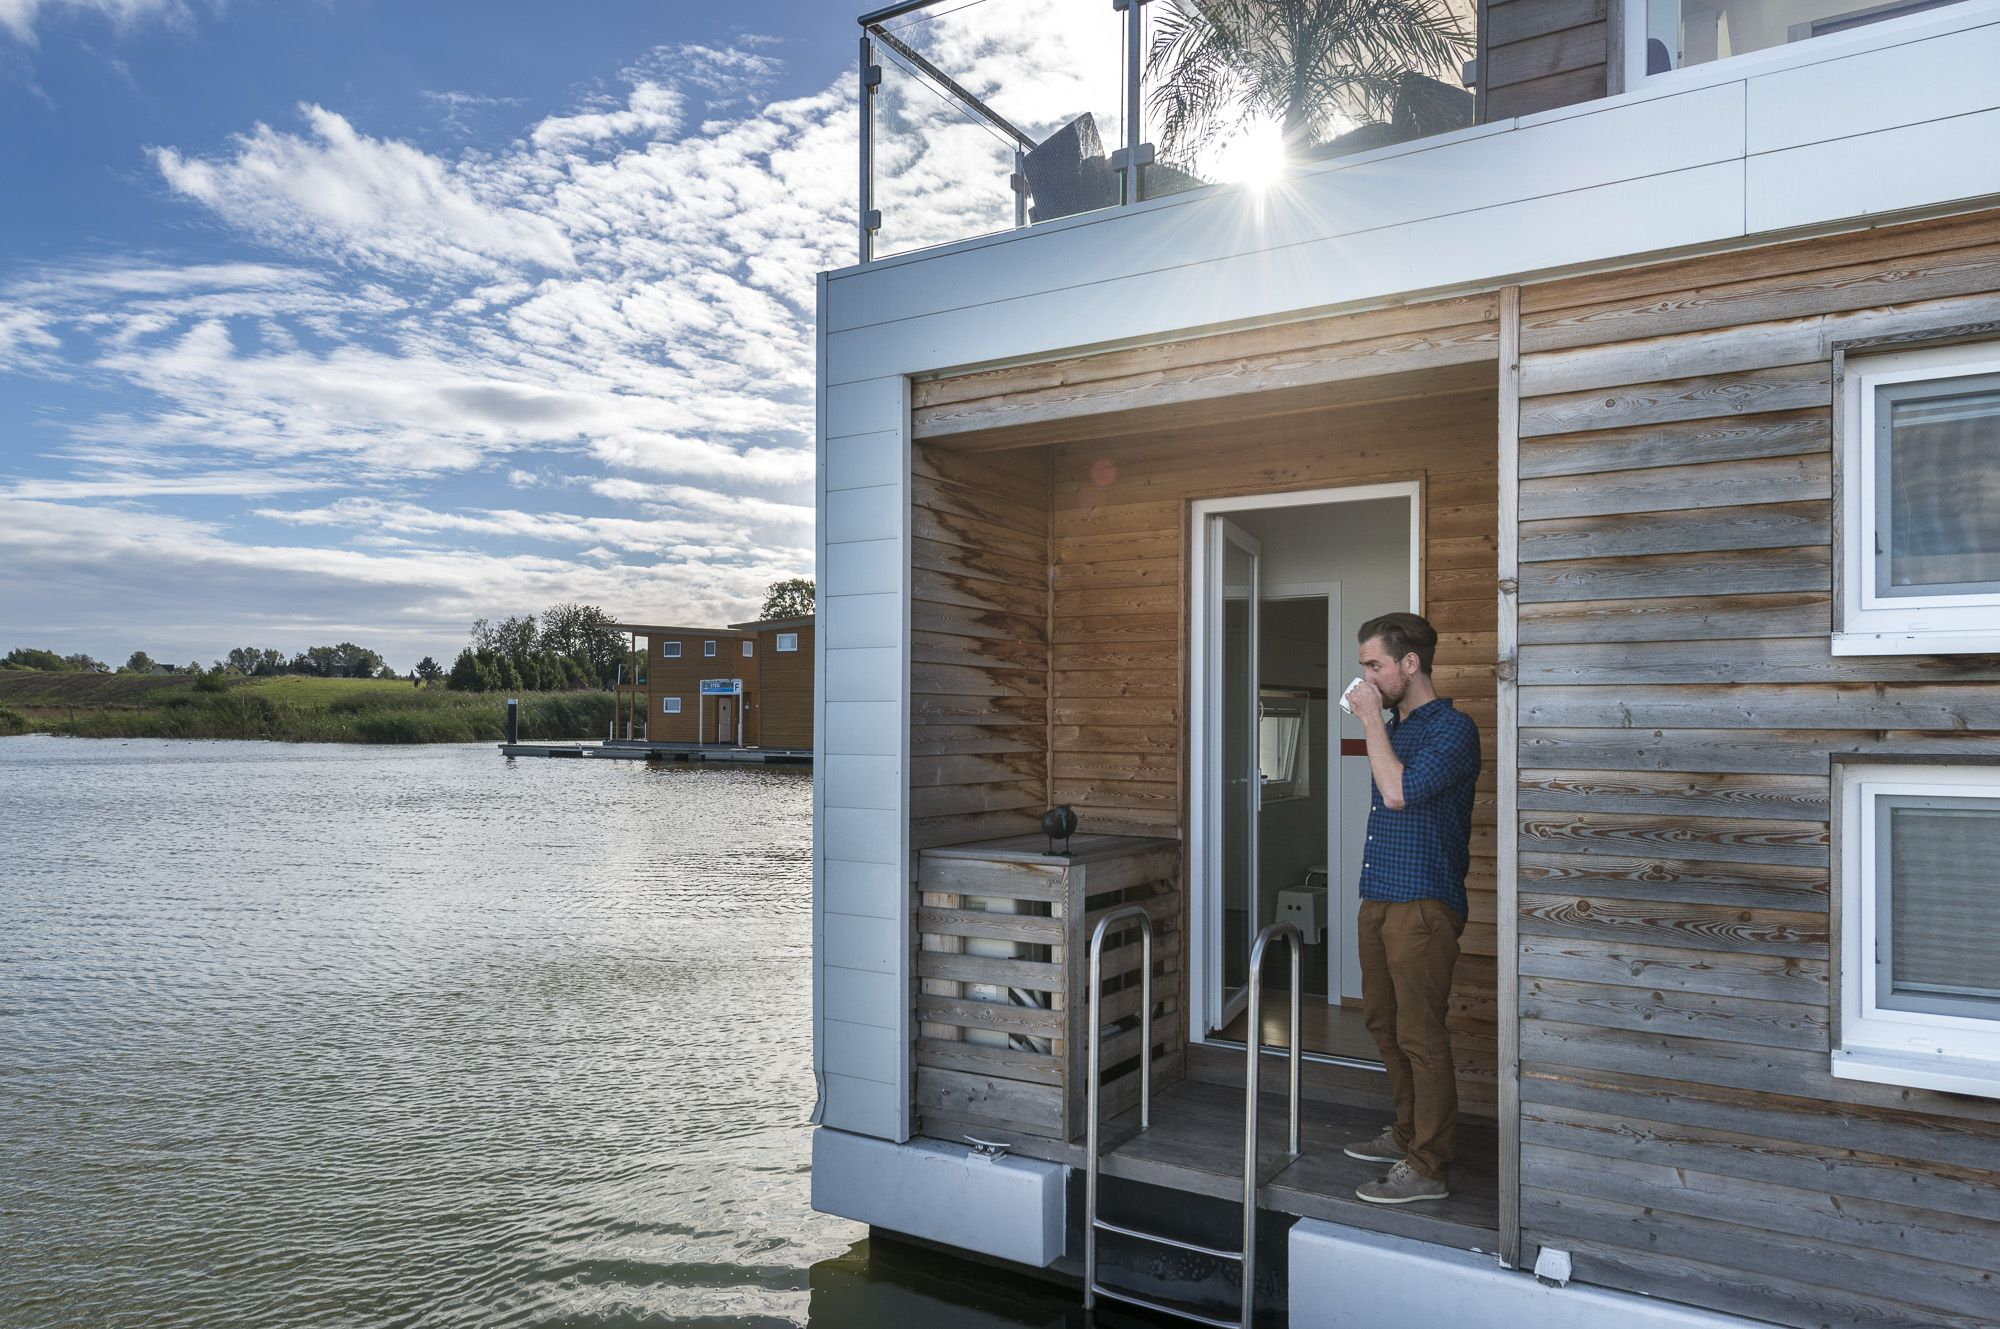 Lakehouse, floating house, Beachhouse - Schwimmendes Haus kaufen ...